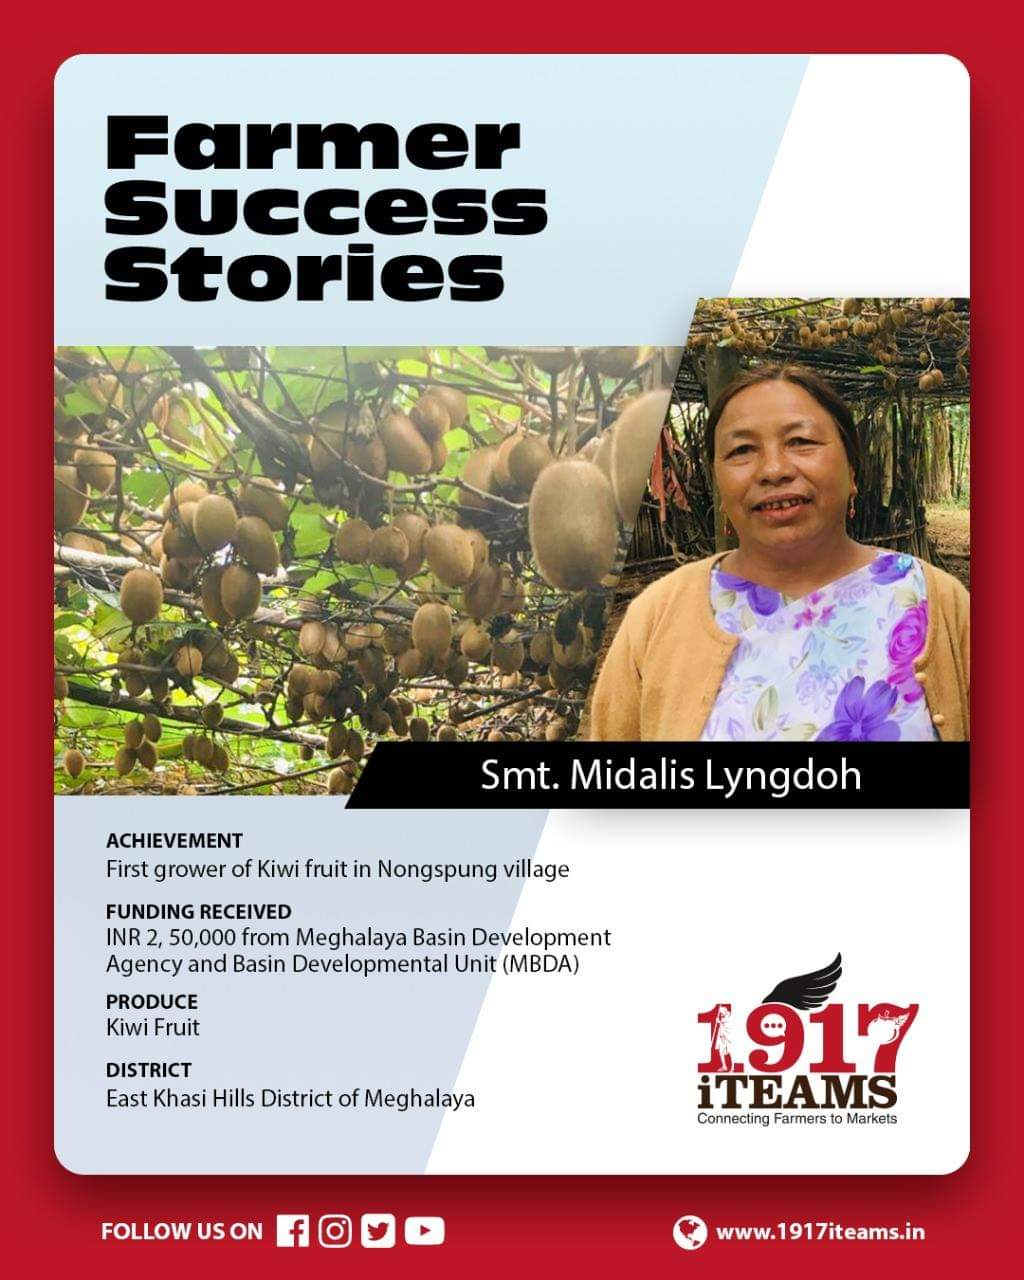 Midalis Lyngdoh: Woman who turned a Meghalaya village to a Kiwi land